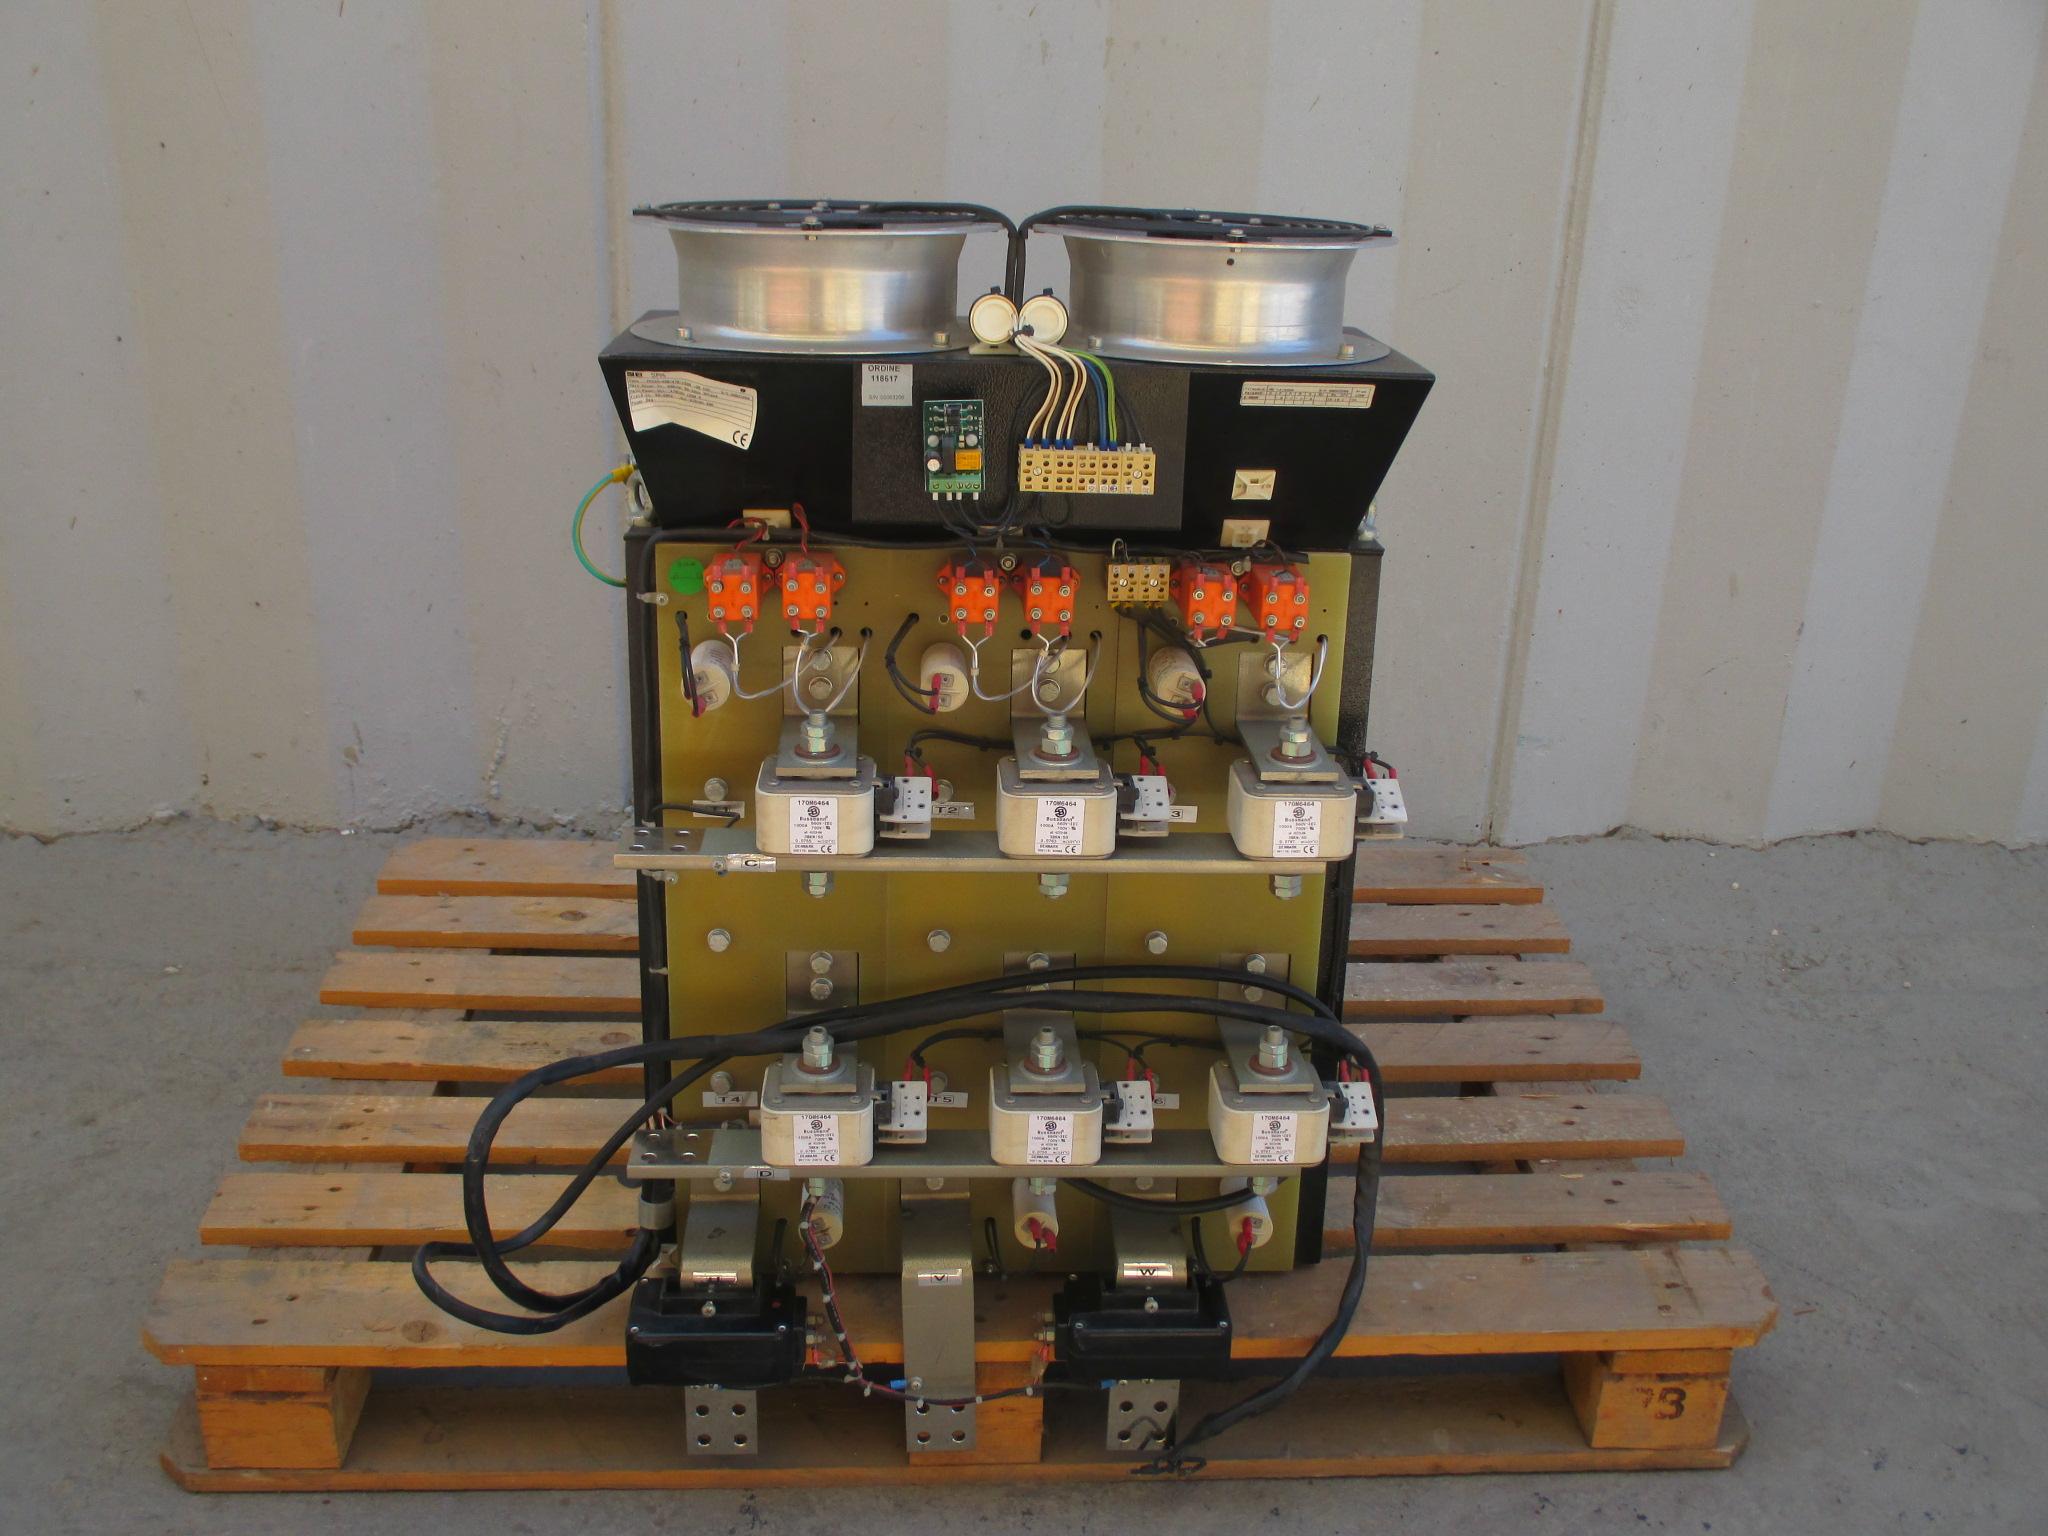 Varie energie alternative in vendita